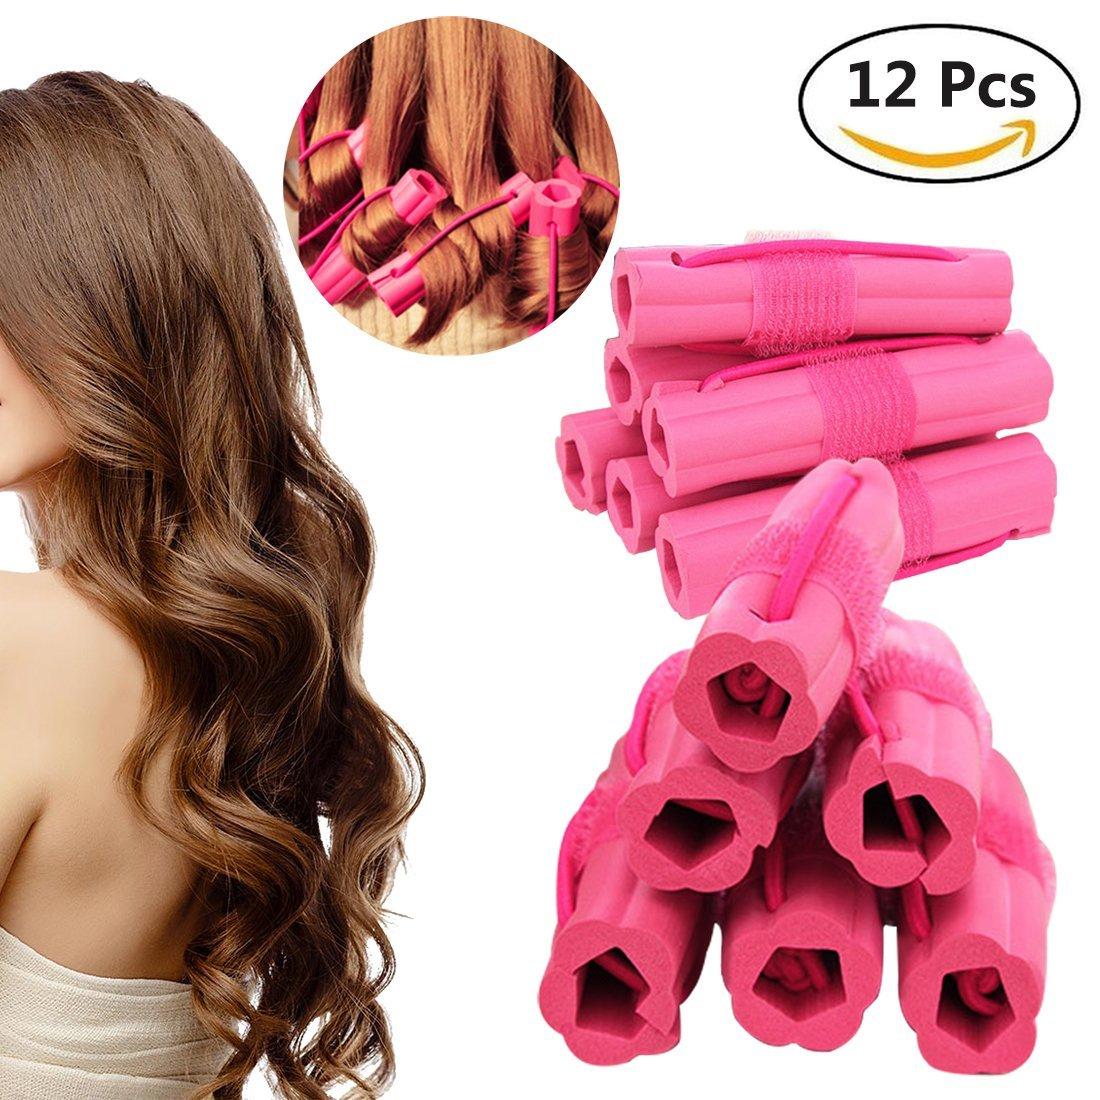 Hair Rollers Curlers, Foam Sponge Hair Curlers, Pillow Hair Curlers, No Heat Sleep Hair Rollers for Long Thick & Thin Hair, Flexible Sleeping Hair Curlers for Women & Girls, 12 Pcs - Rose Red